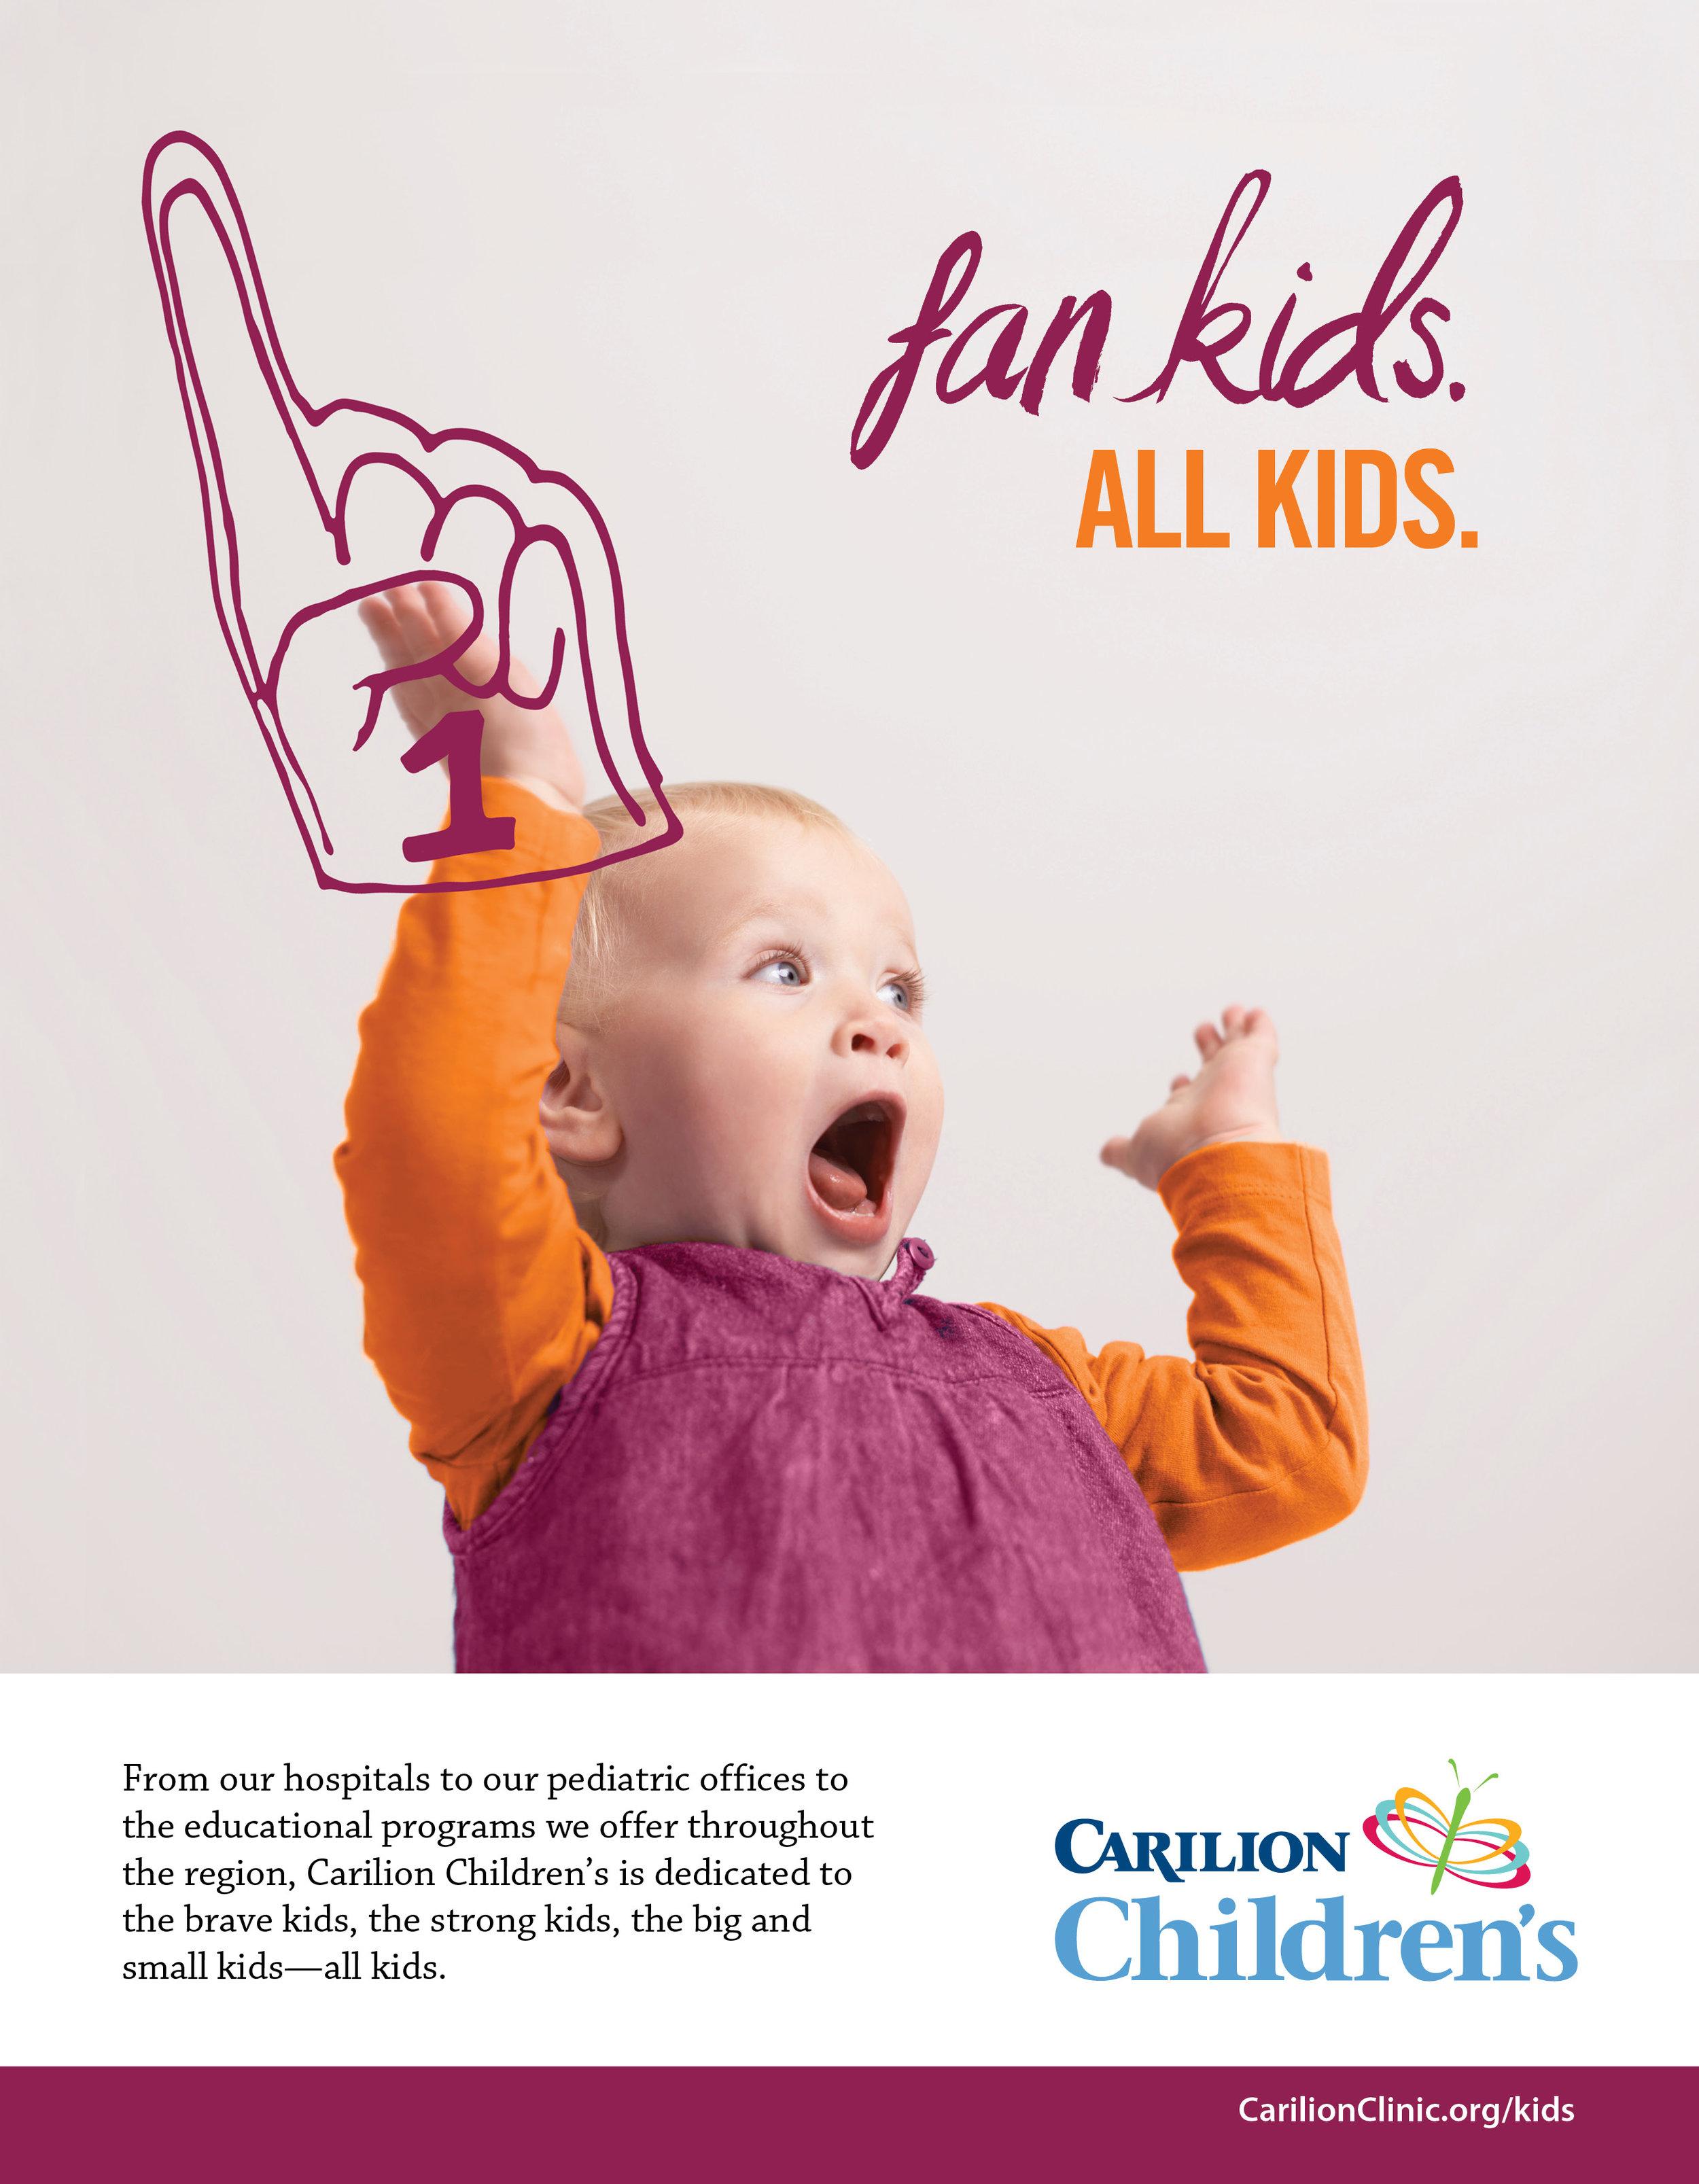 C66749 Carilion Childrens VT Football Bowl Game Ad_FoamFinger_8 5x11 w bleed.jpg